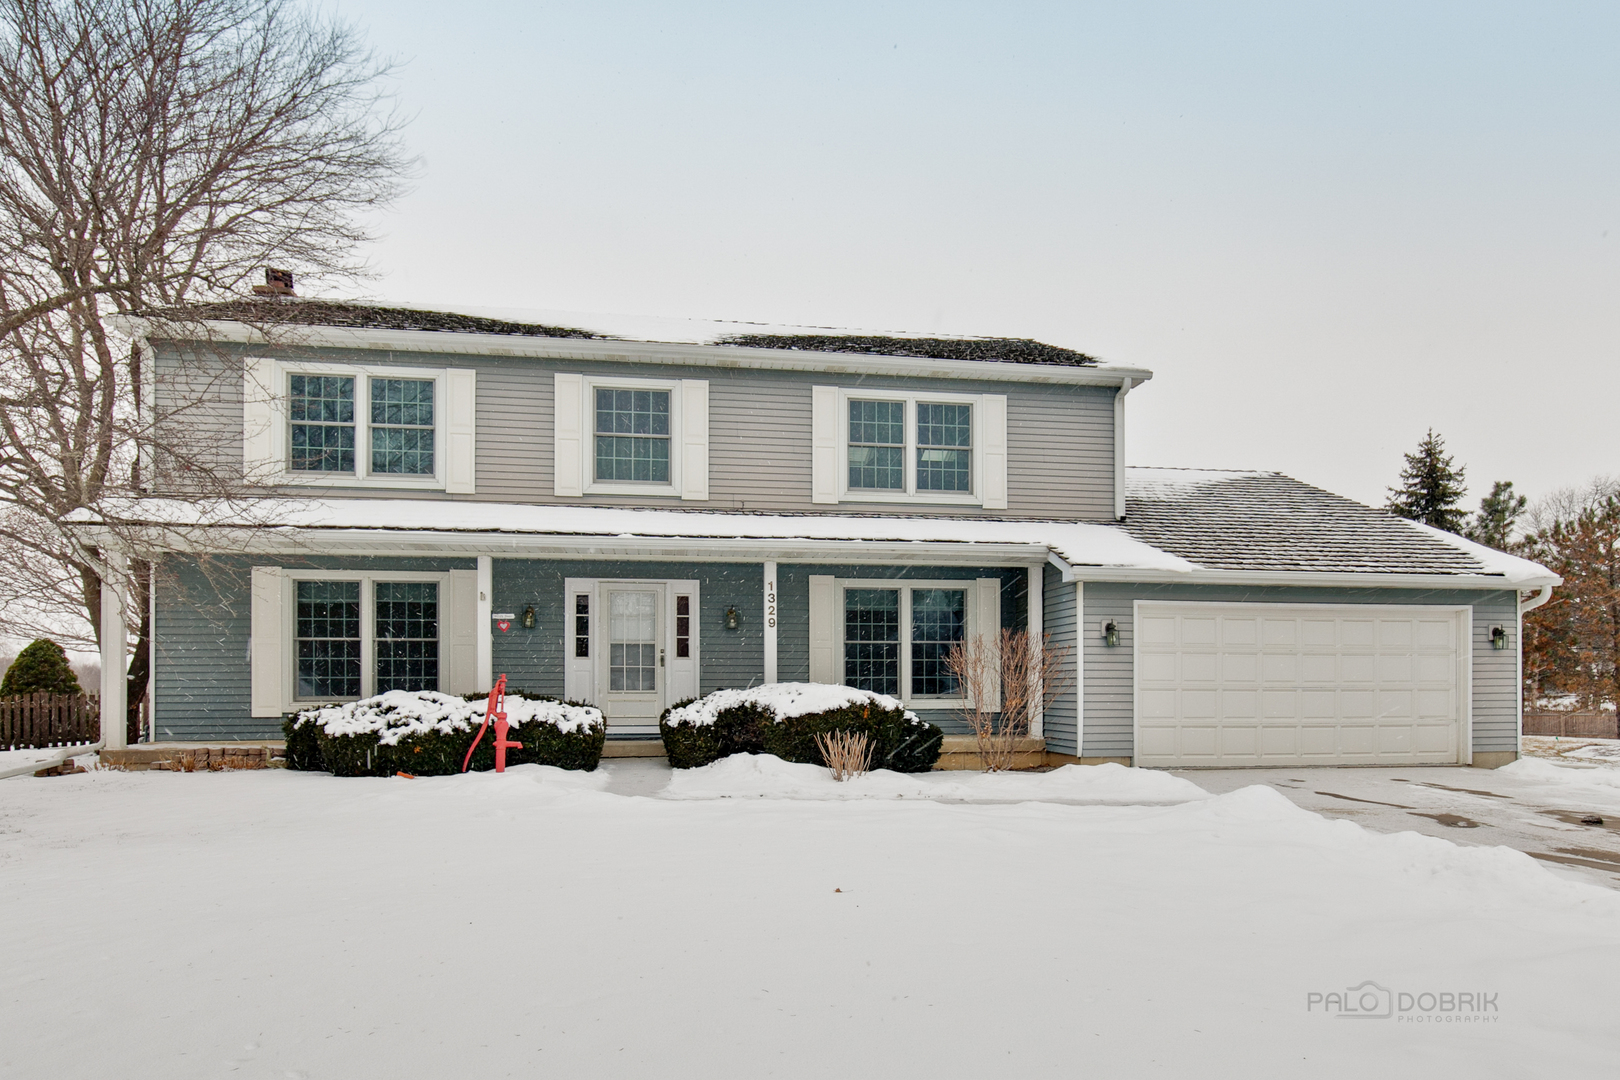 1329 Kristin Drive, Libertyville in Lake County, IL 60048 Home for Sale